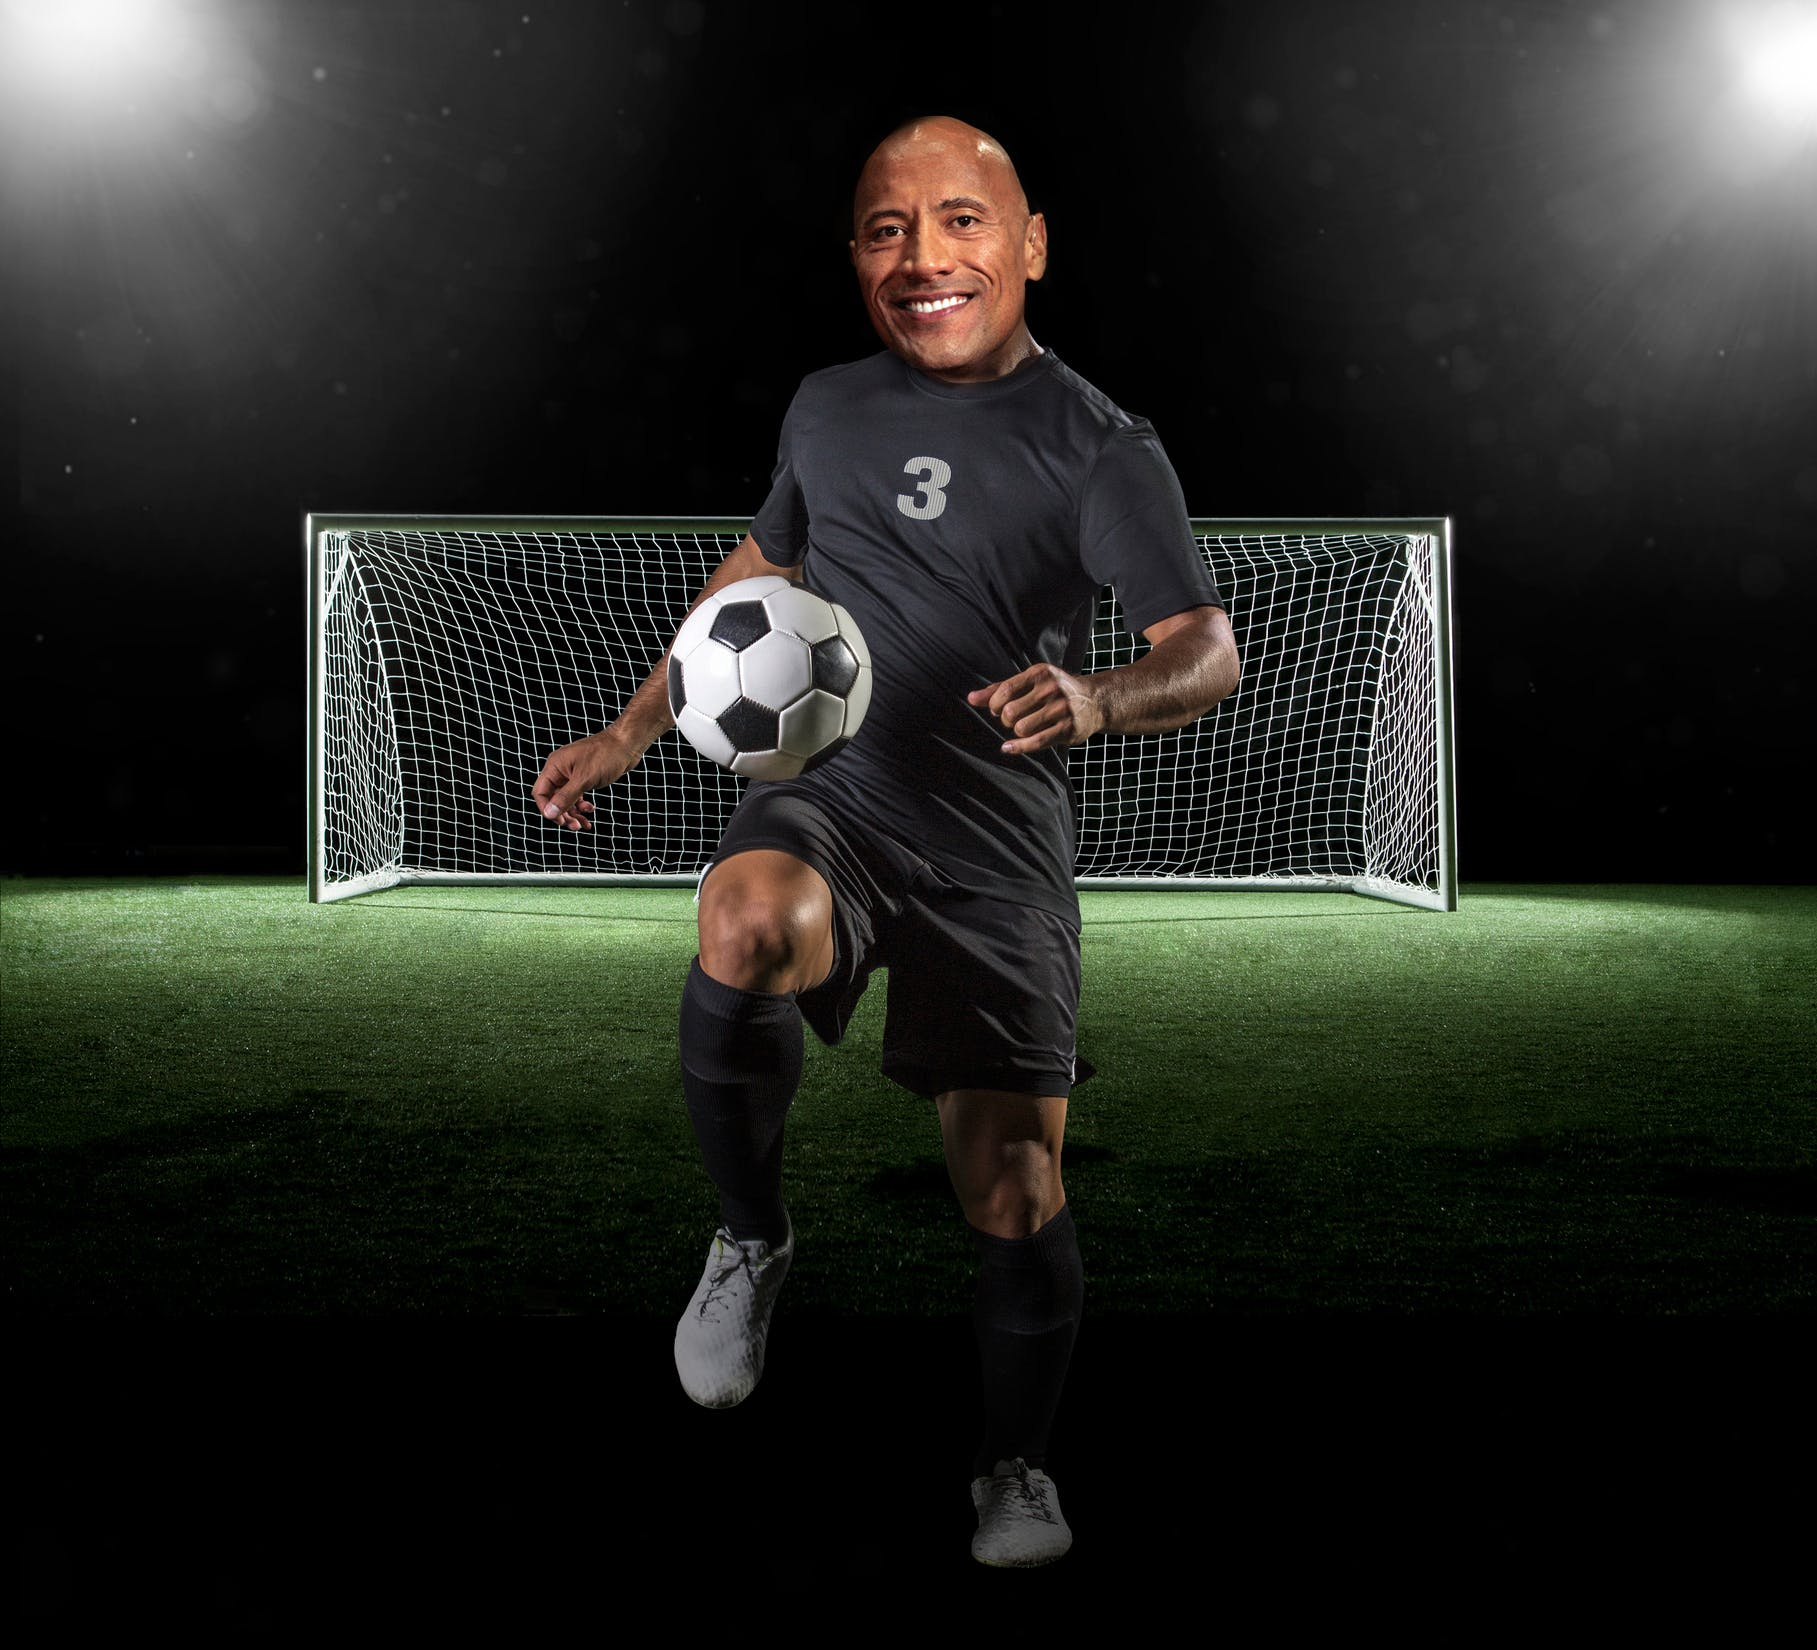 Dwayne The Rock Johnson as a footballer